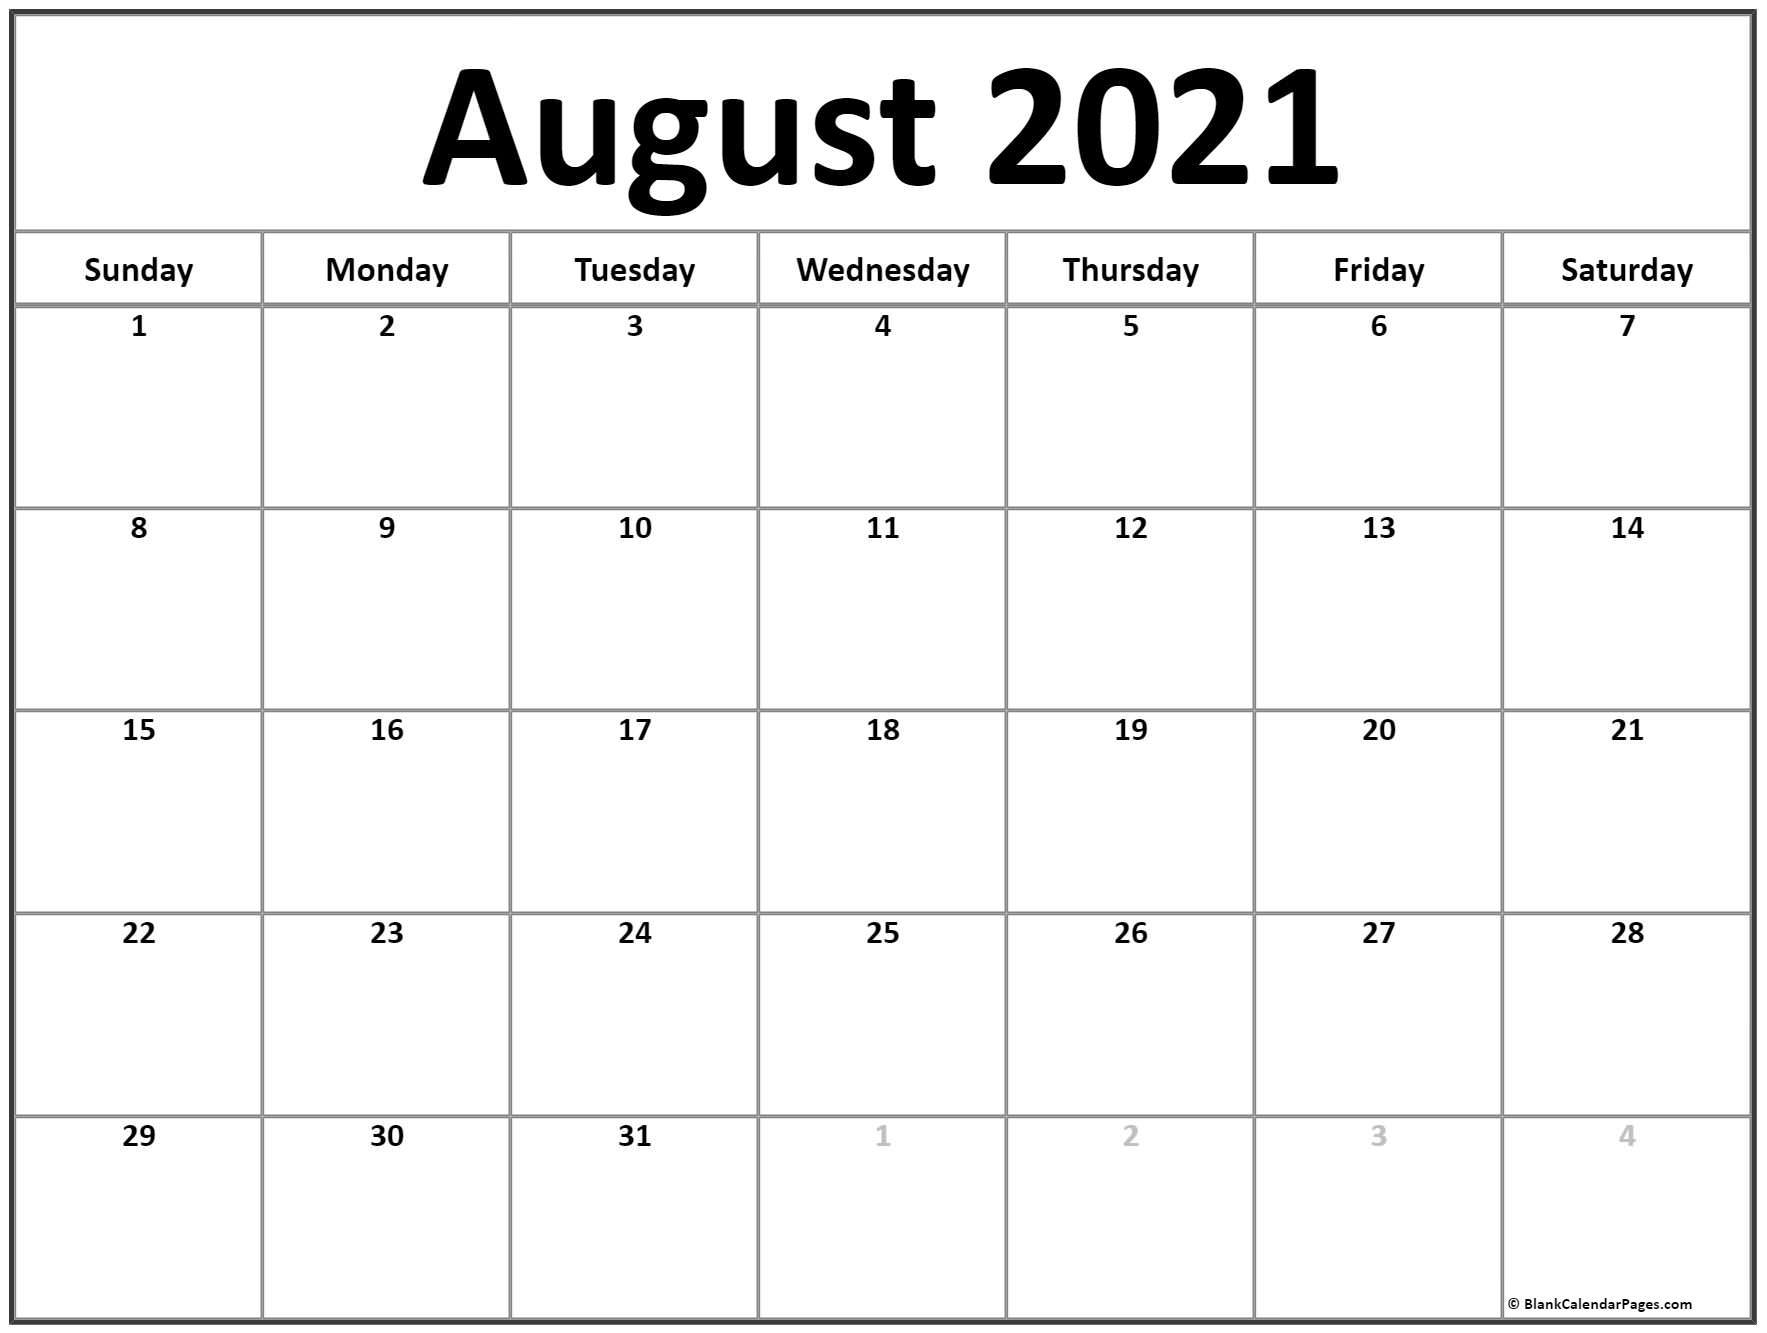 August 2021 Calendar | Free Printable Monthly Calendars